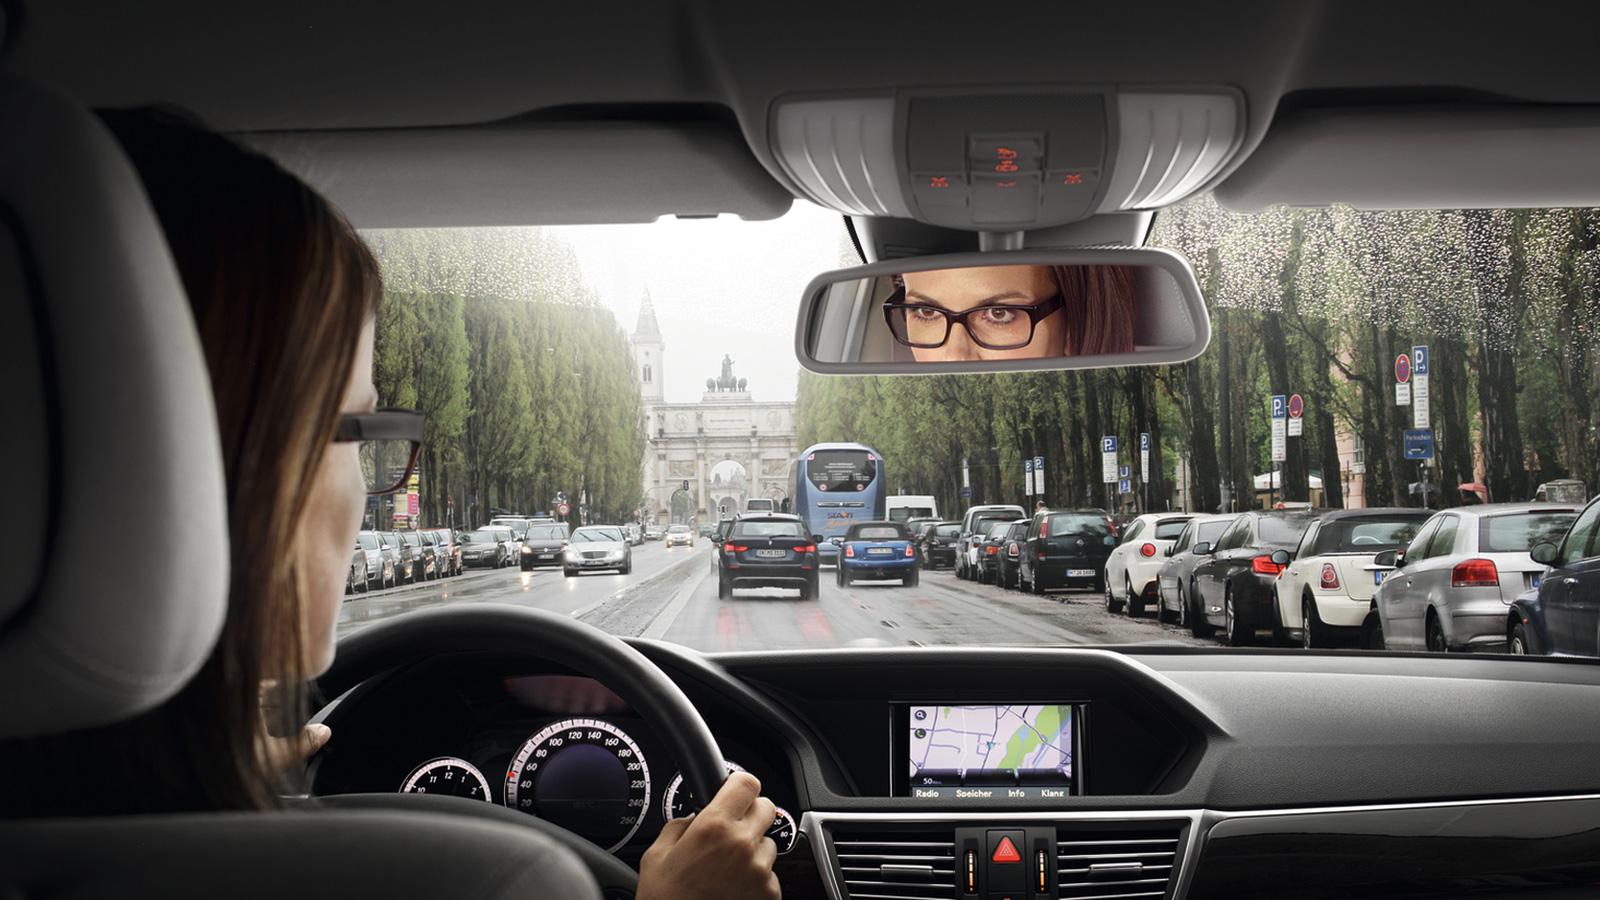 zeiss_drivesafe_keyvisual_auto